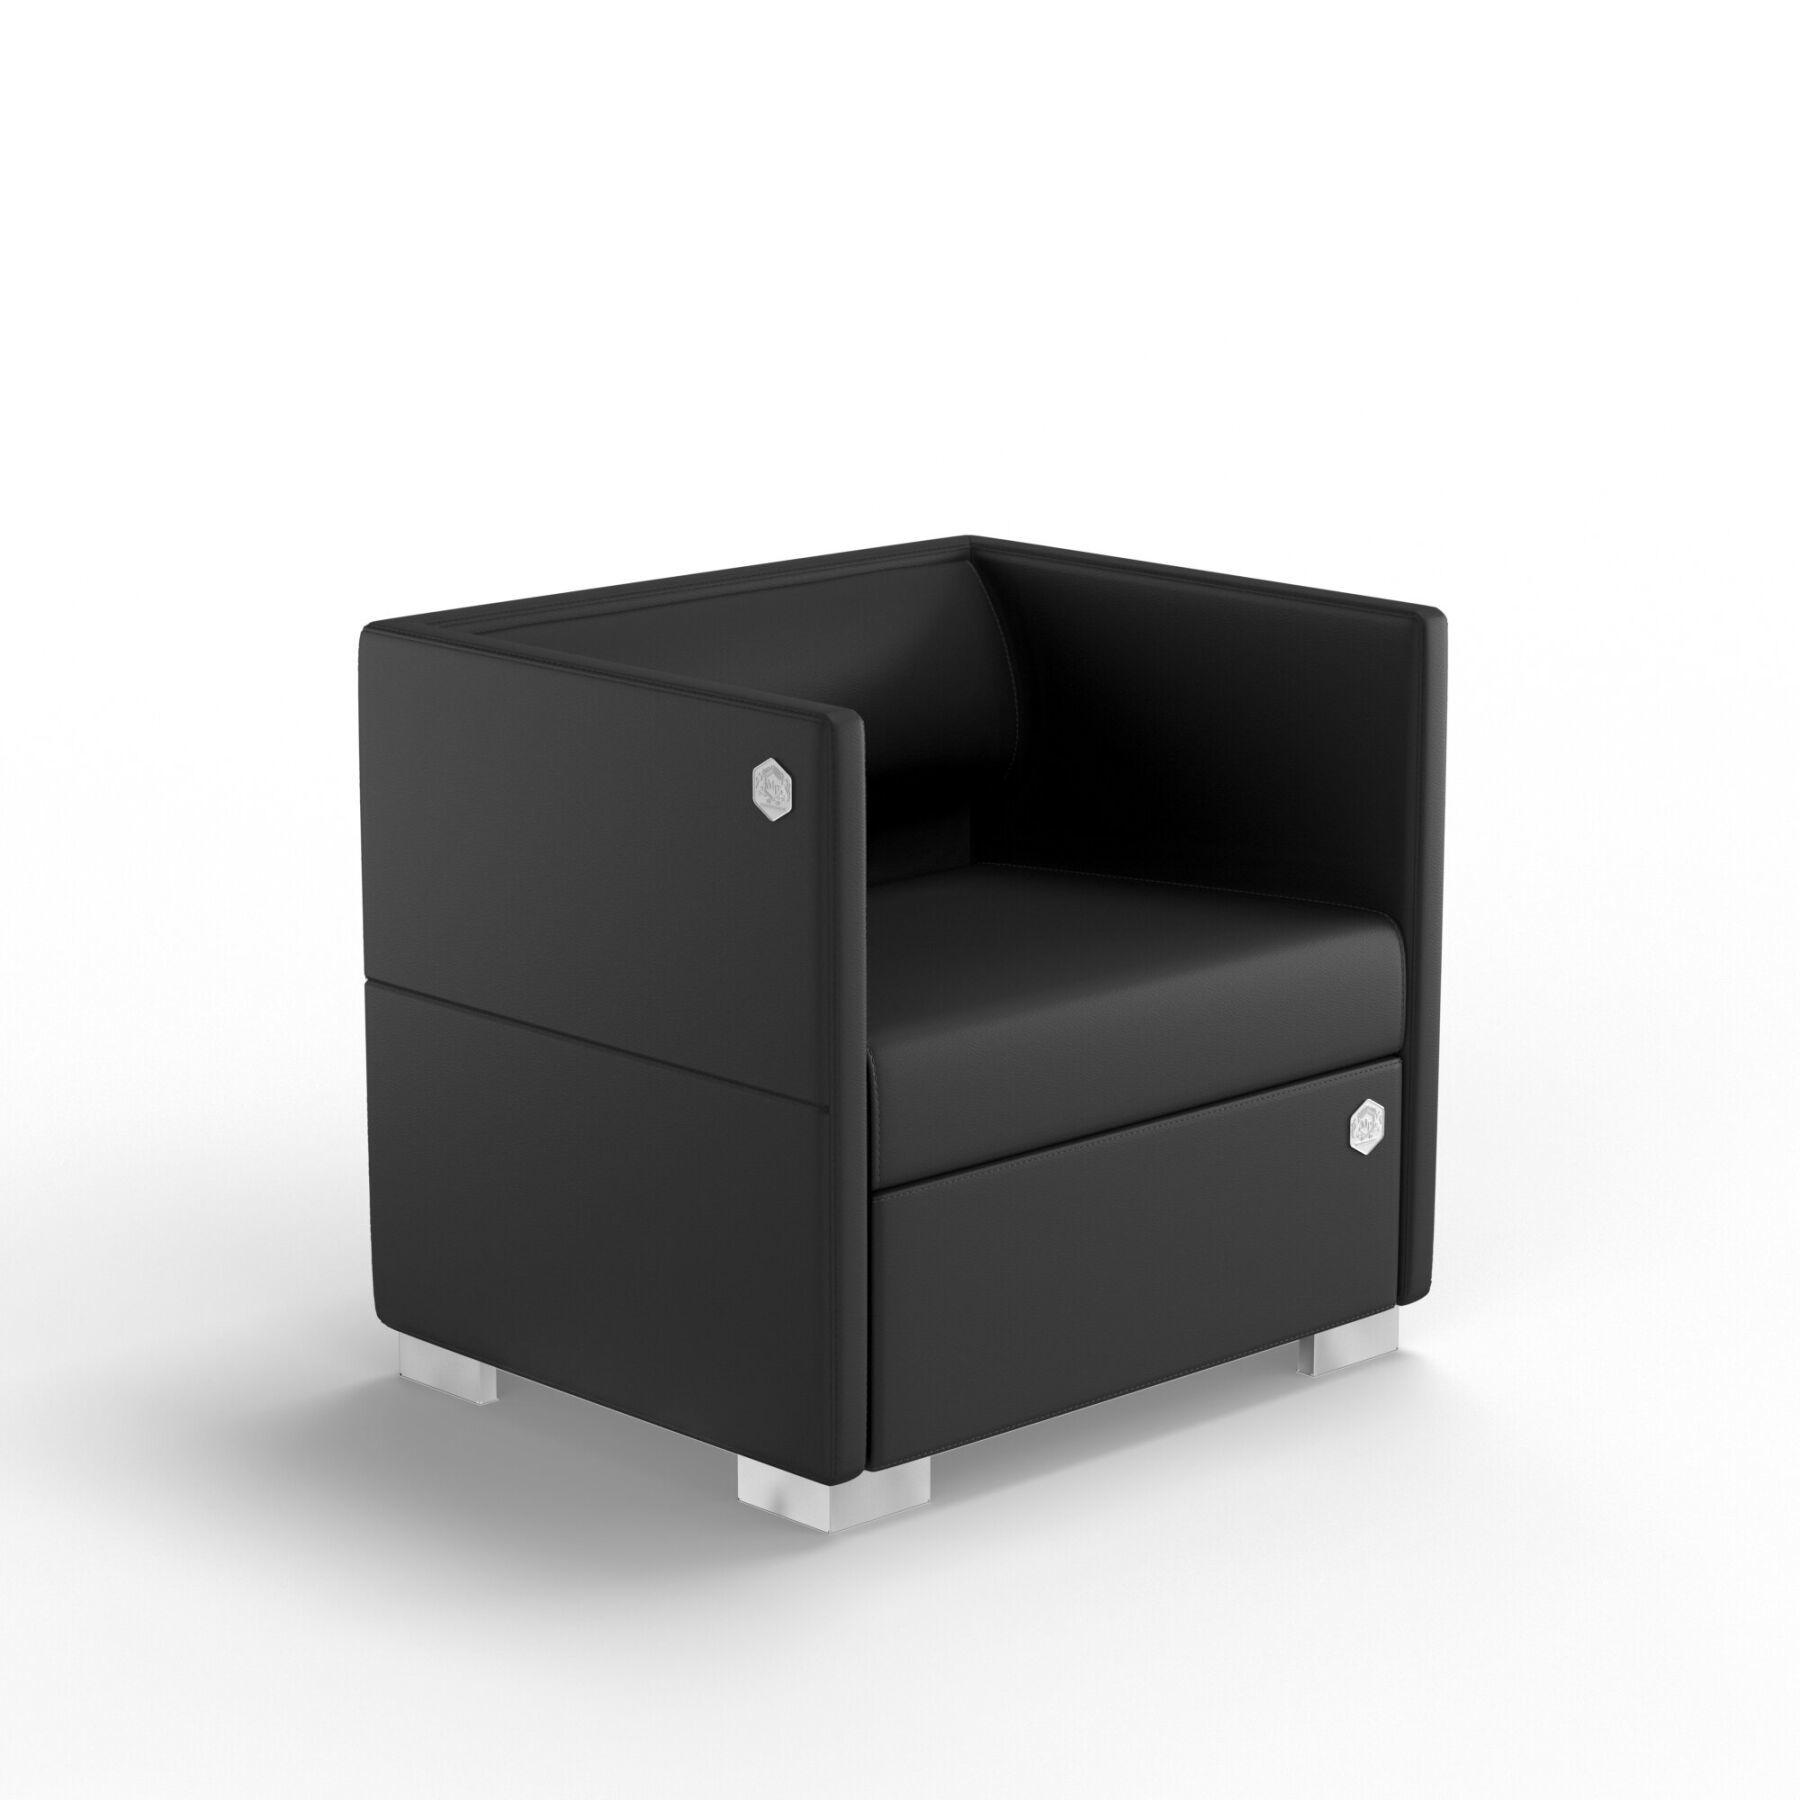 Мягкое кресло KULIK SYSTEM LOUNGE Экокожа 1